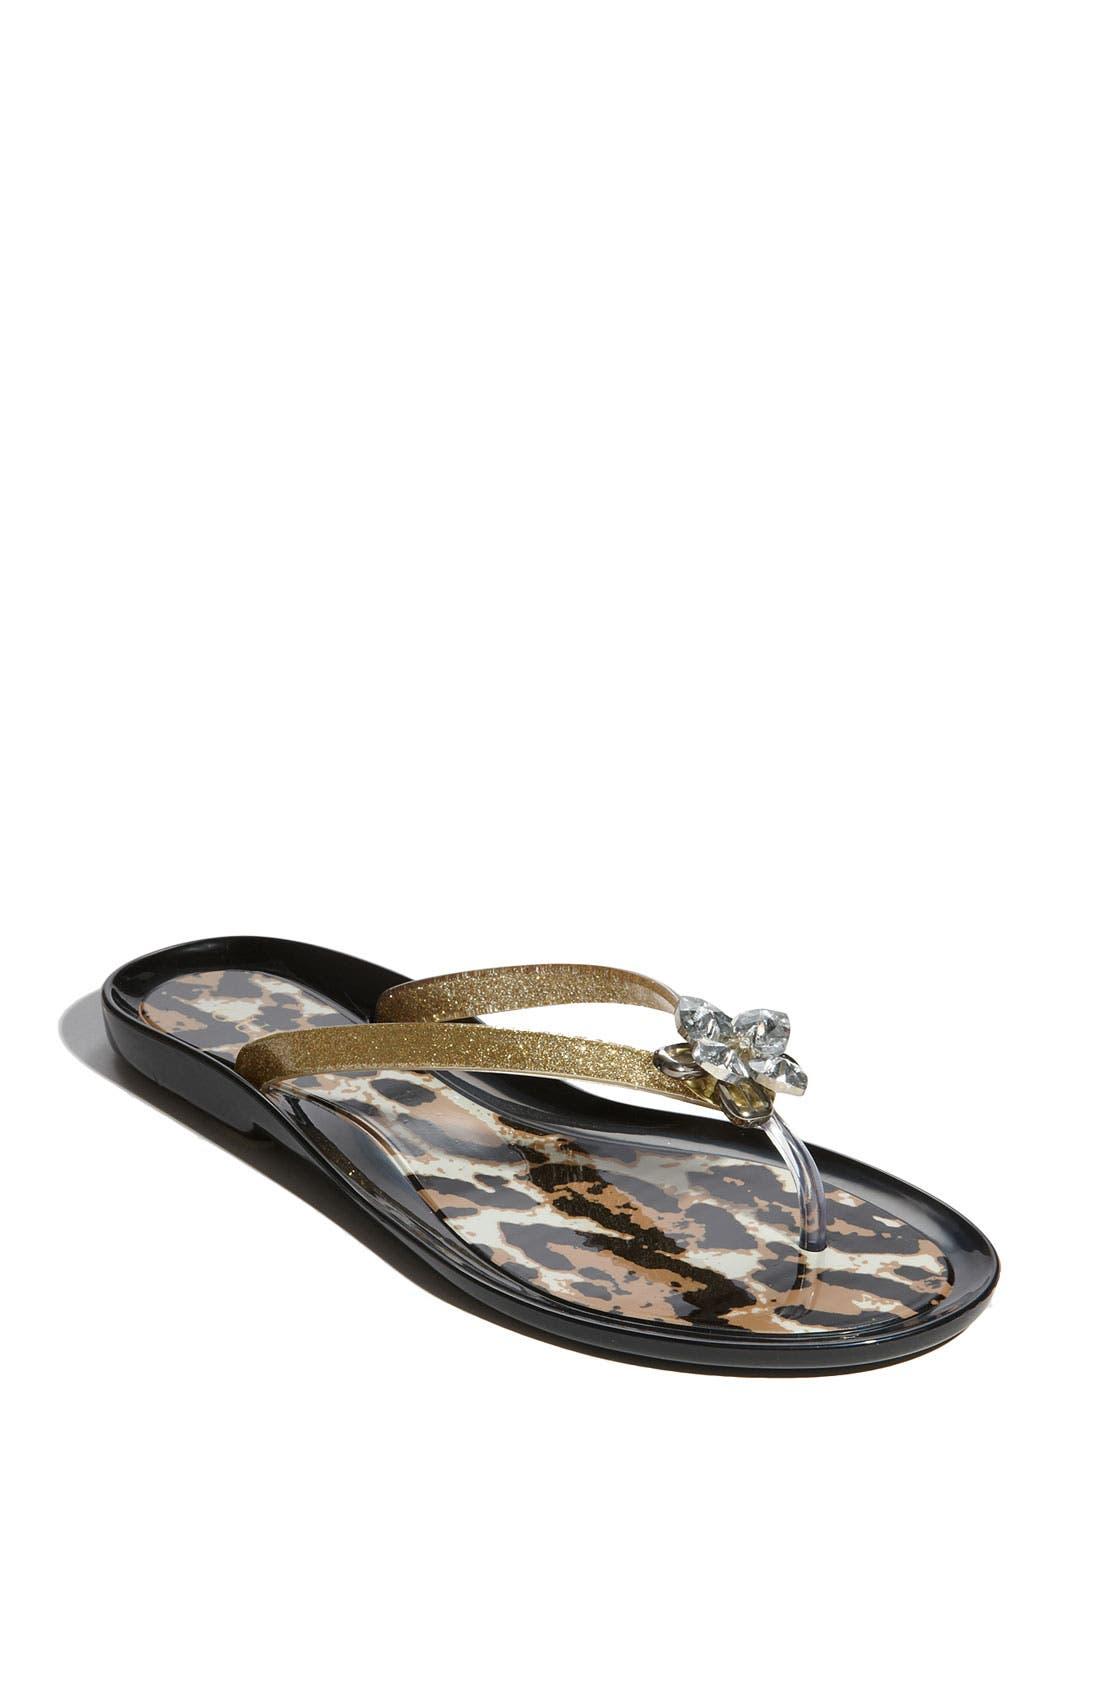 Main Image - GUESS 'Neno' Sandal